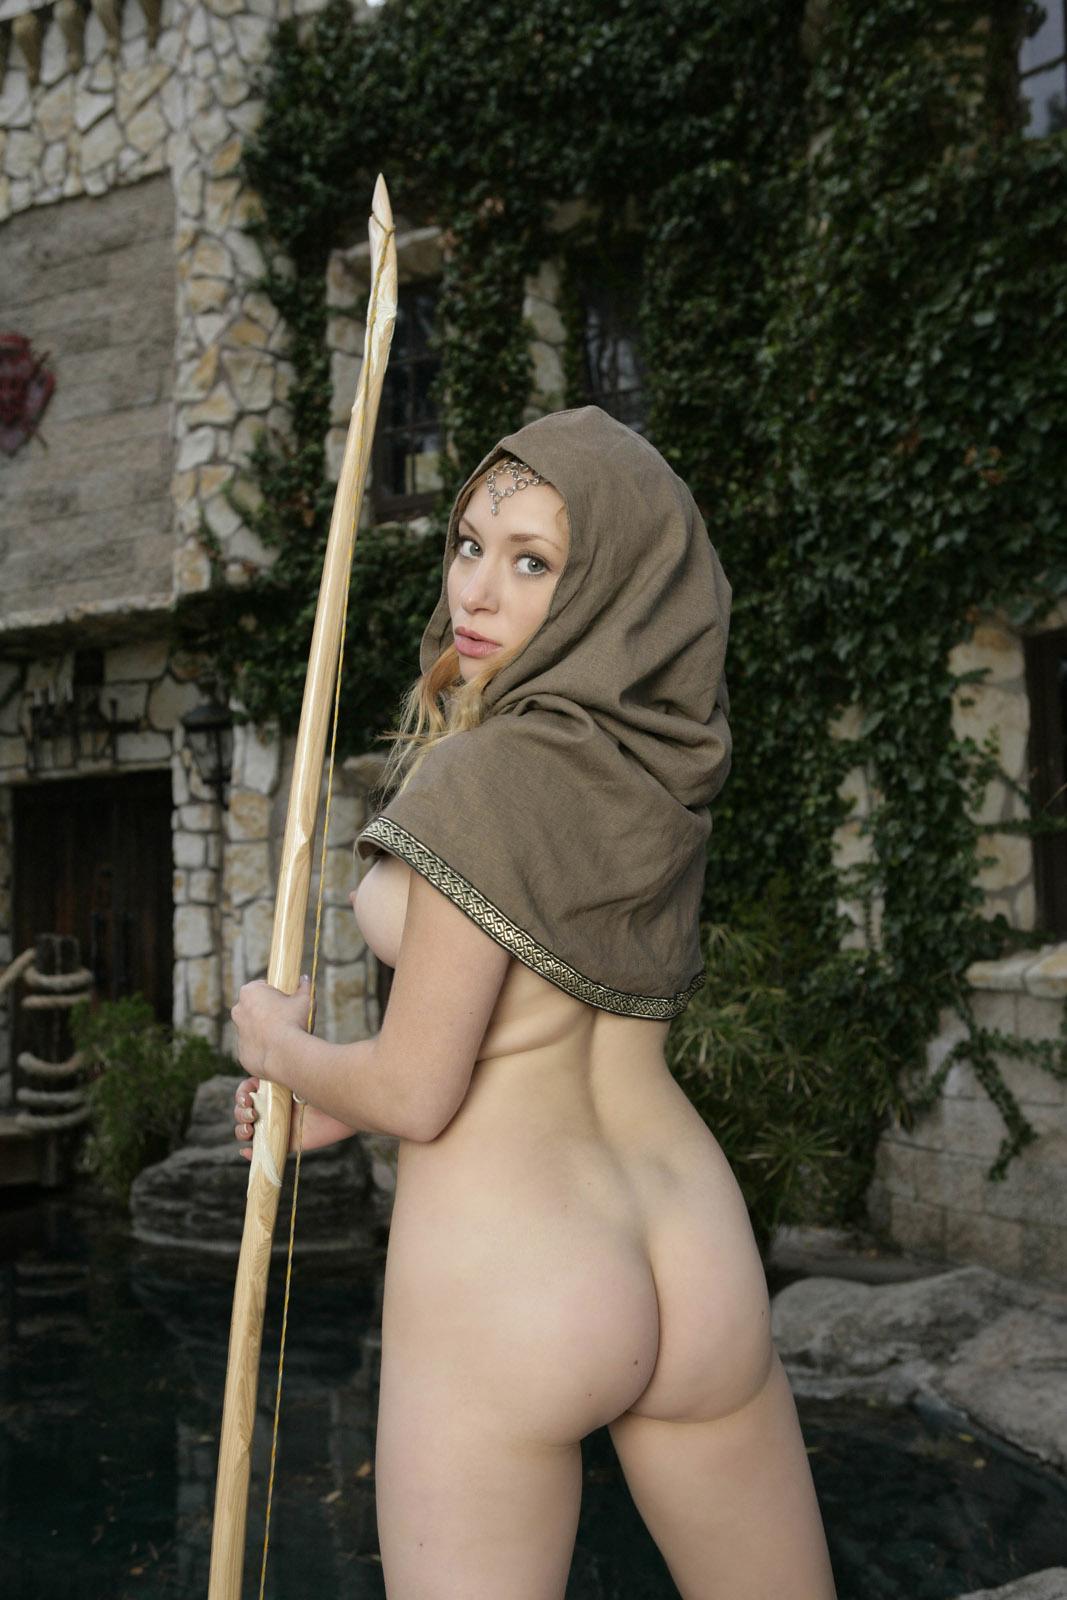 nude girl game characters